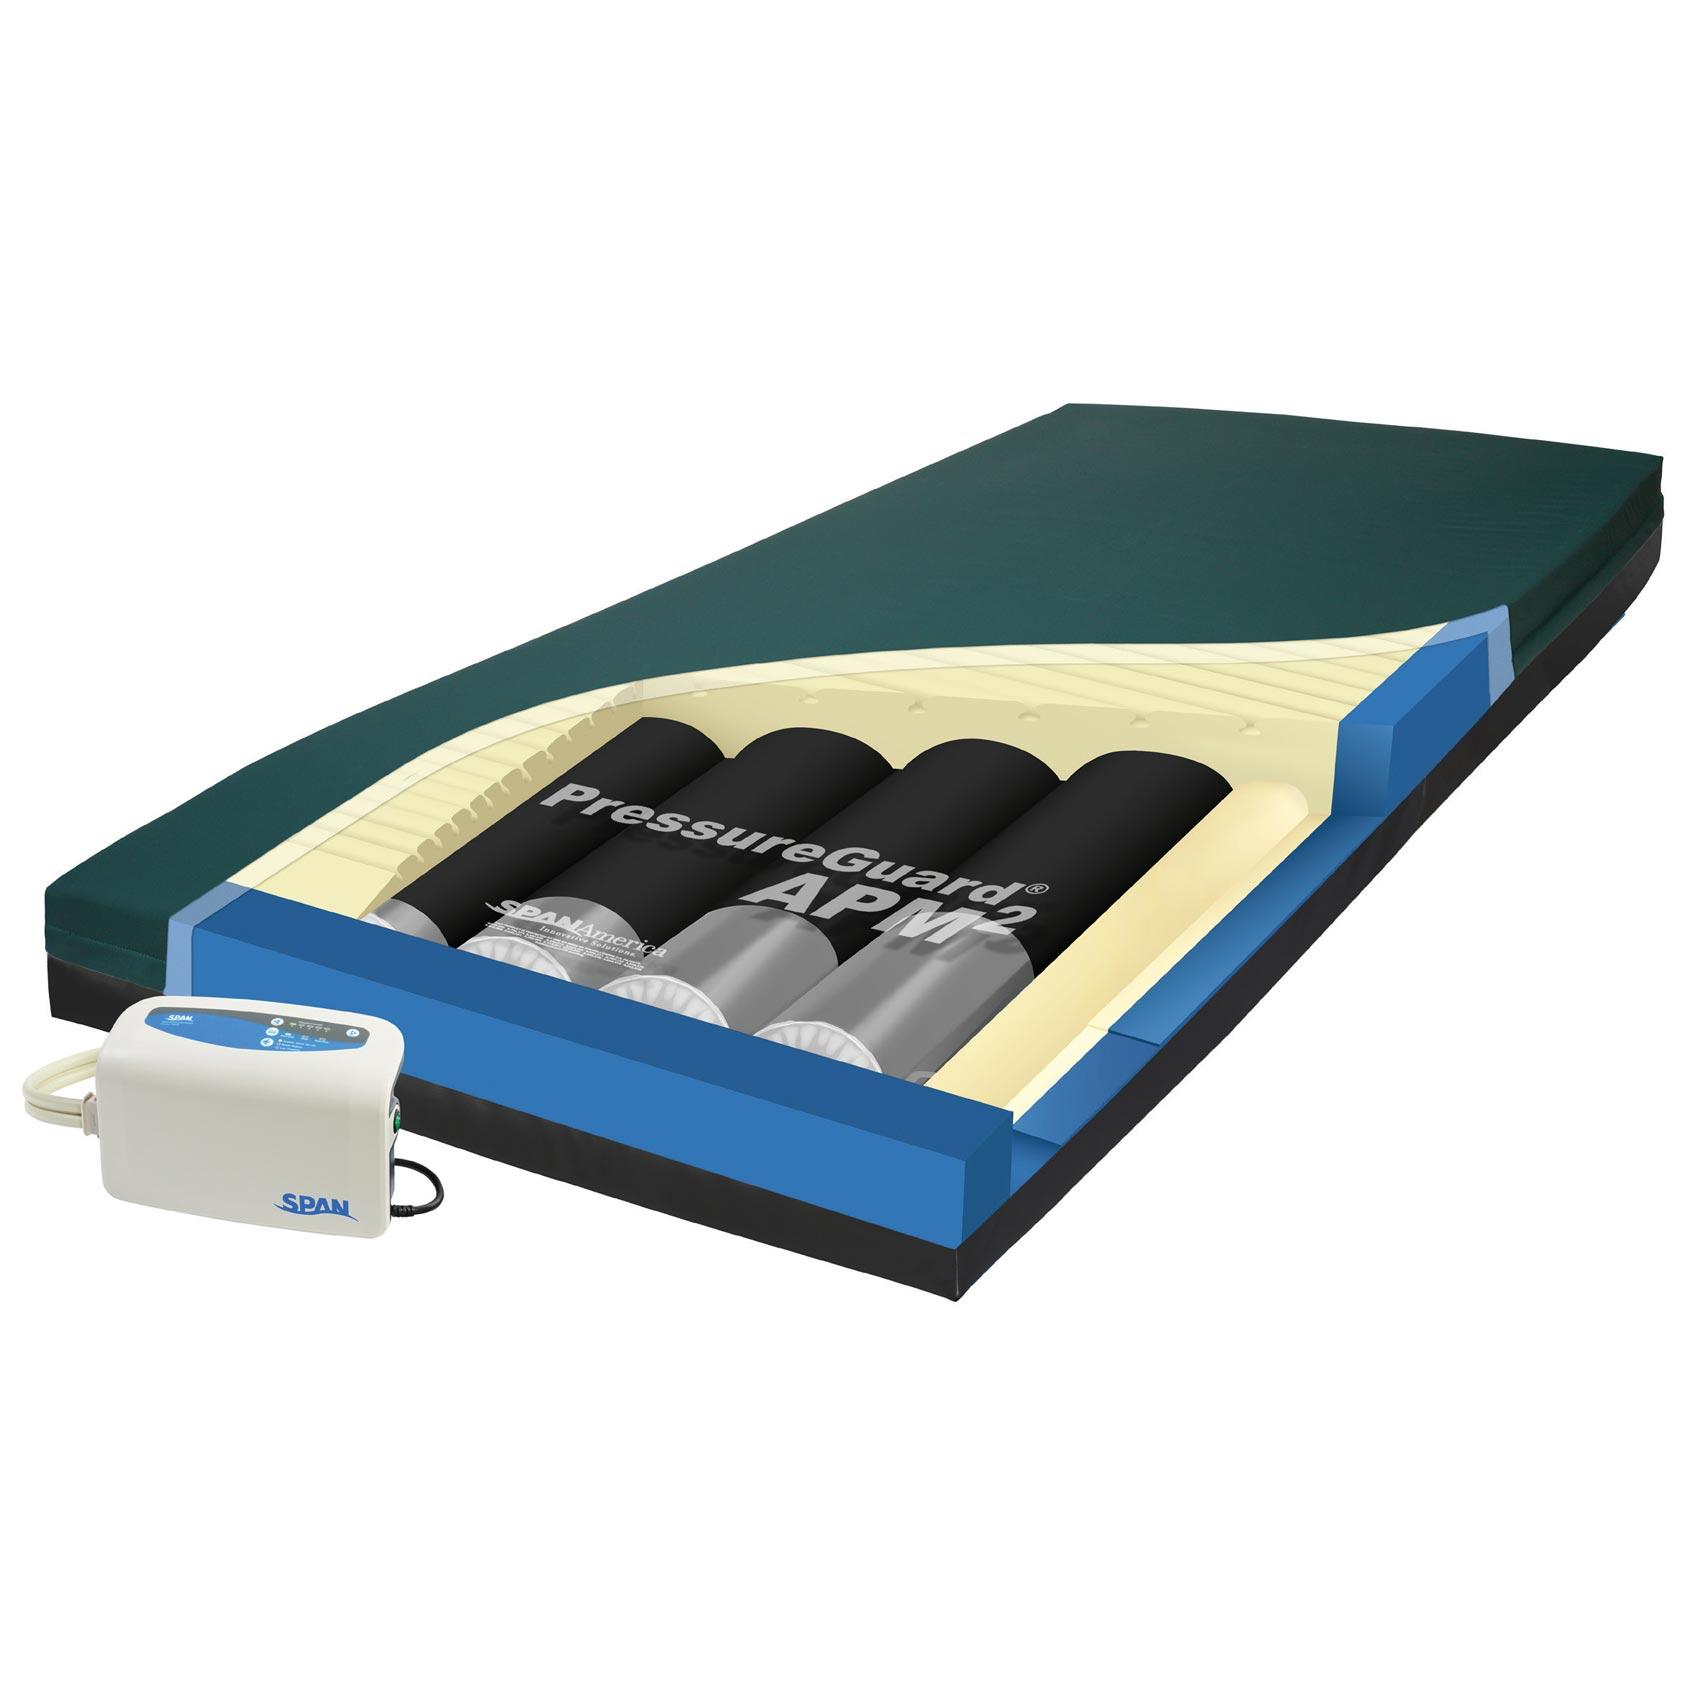 Span America pressureguard APM2 mattress